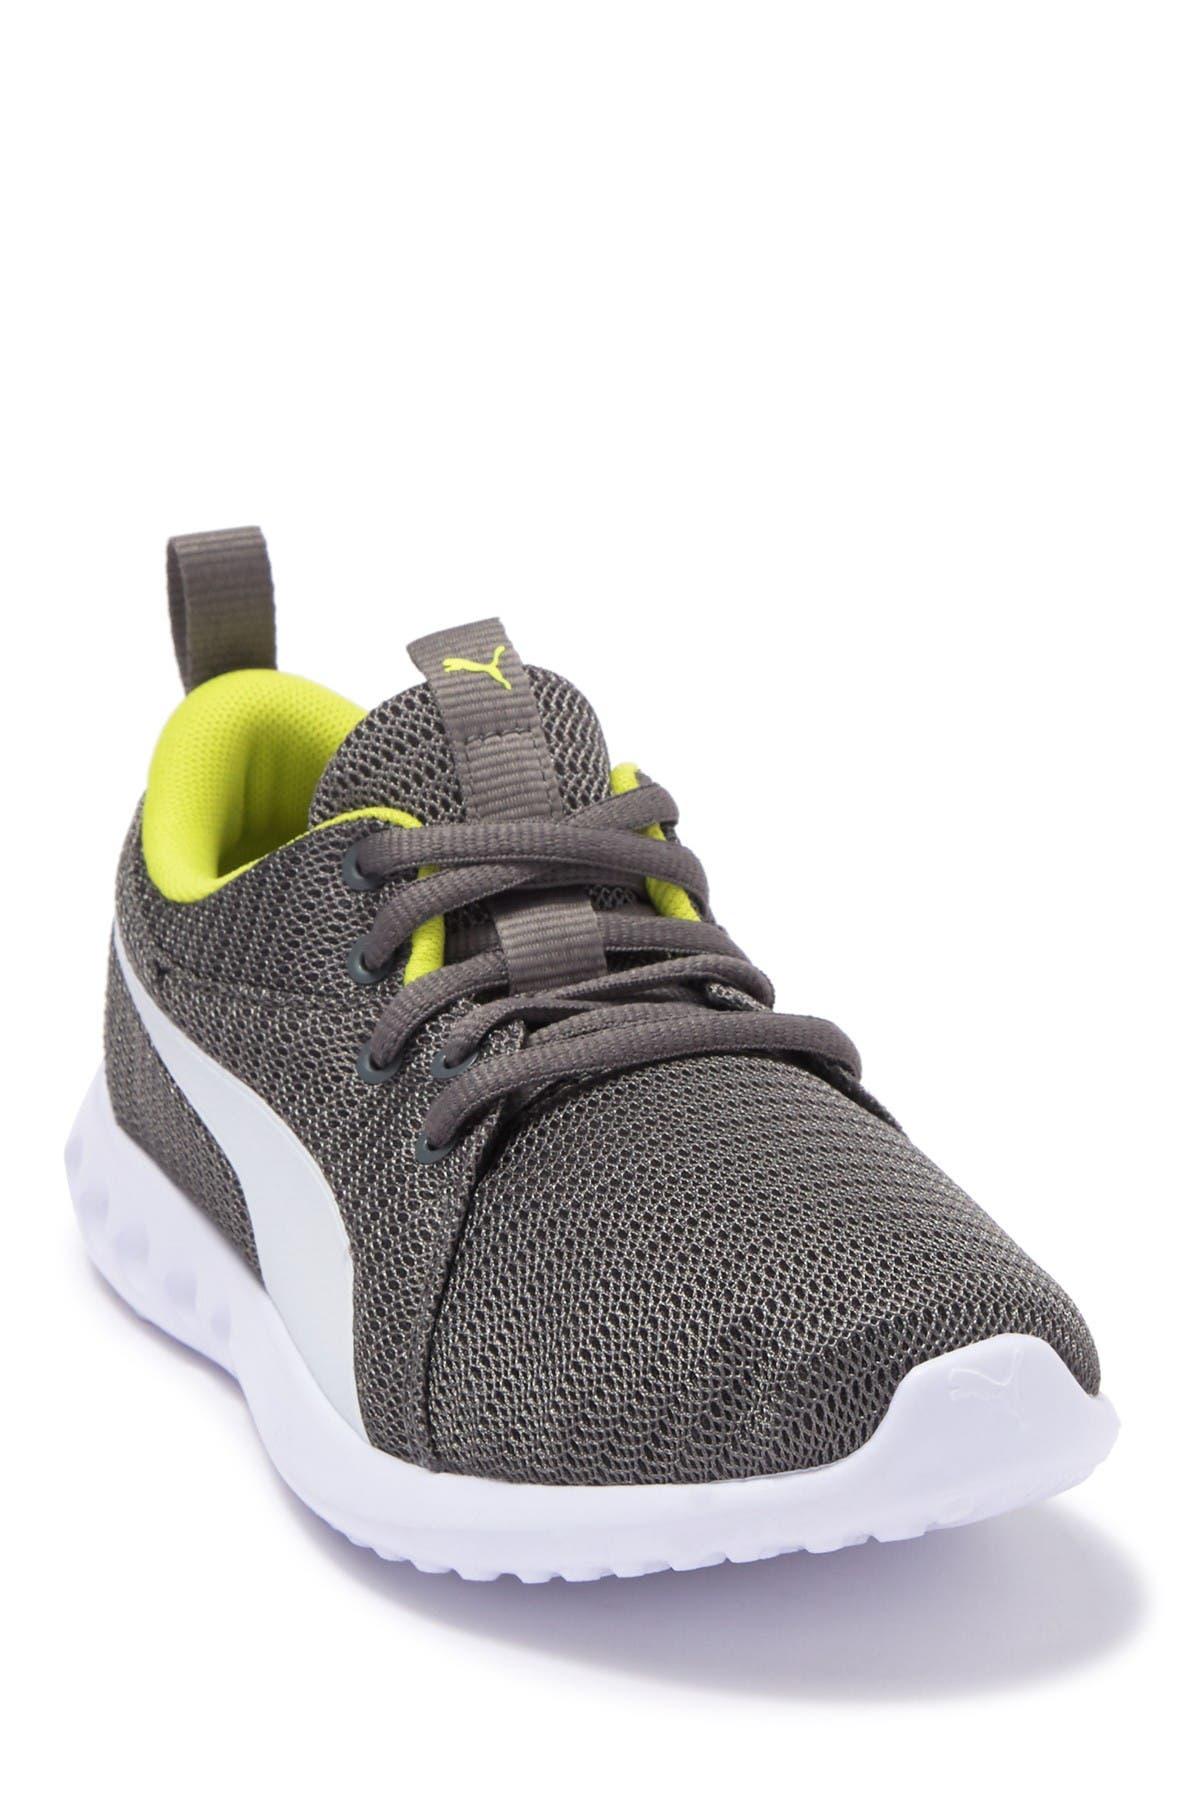 Image of PUMA Carson 2 JR Sneaker